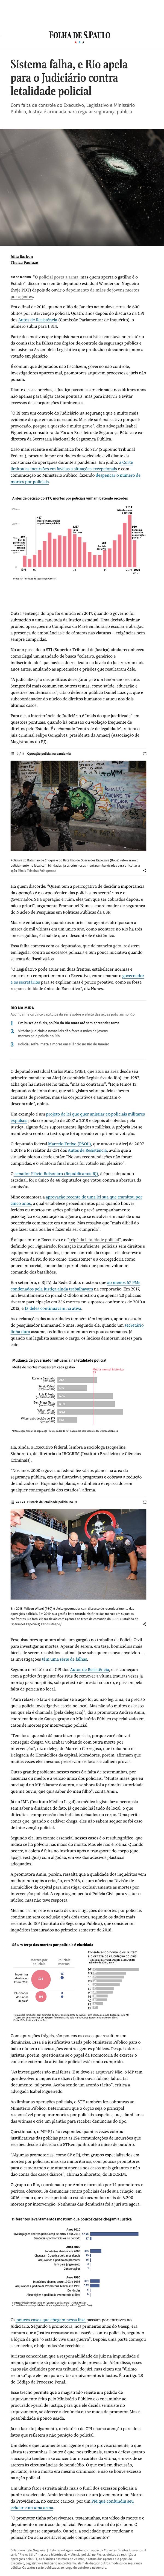 screenshot-www1.folha.uol.com.br-2020.11